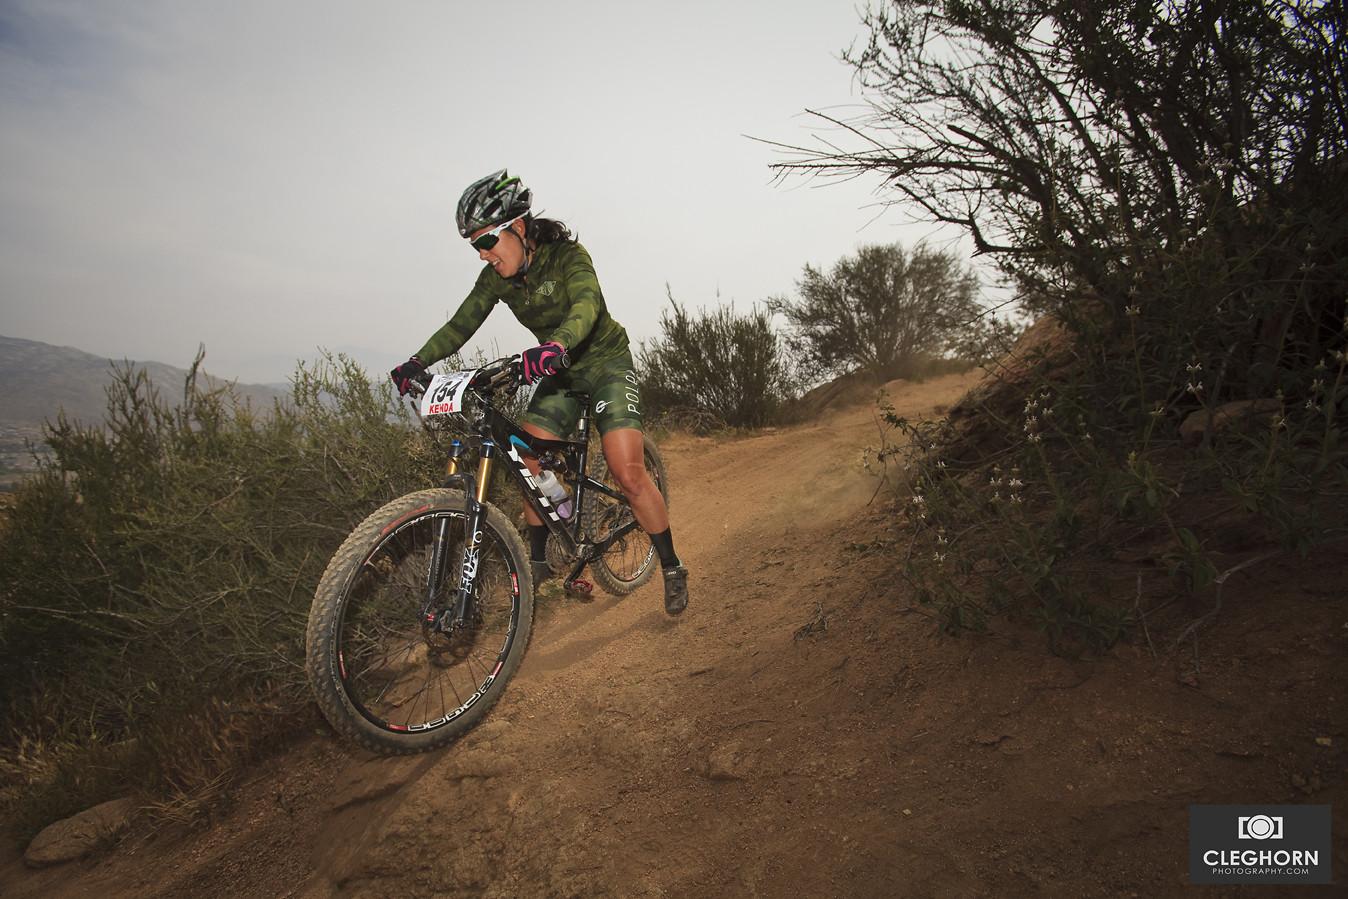 Jenna Jammer Kowalski - Cleghorn Photography - Mountain Biking Pictures - Vital MTB